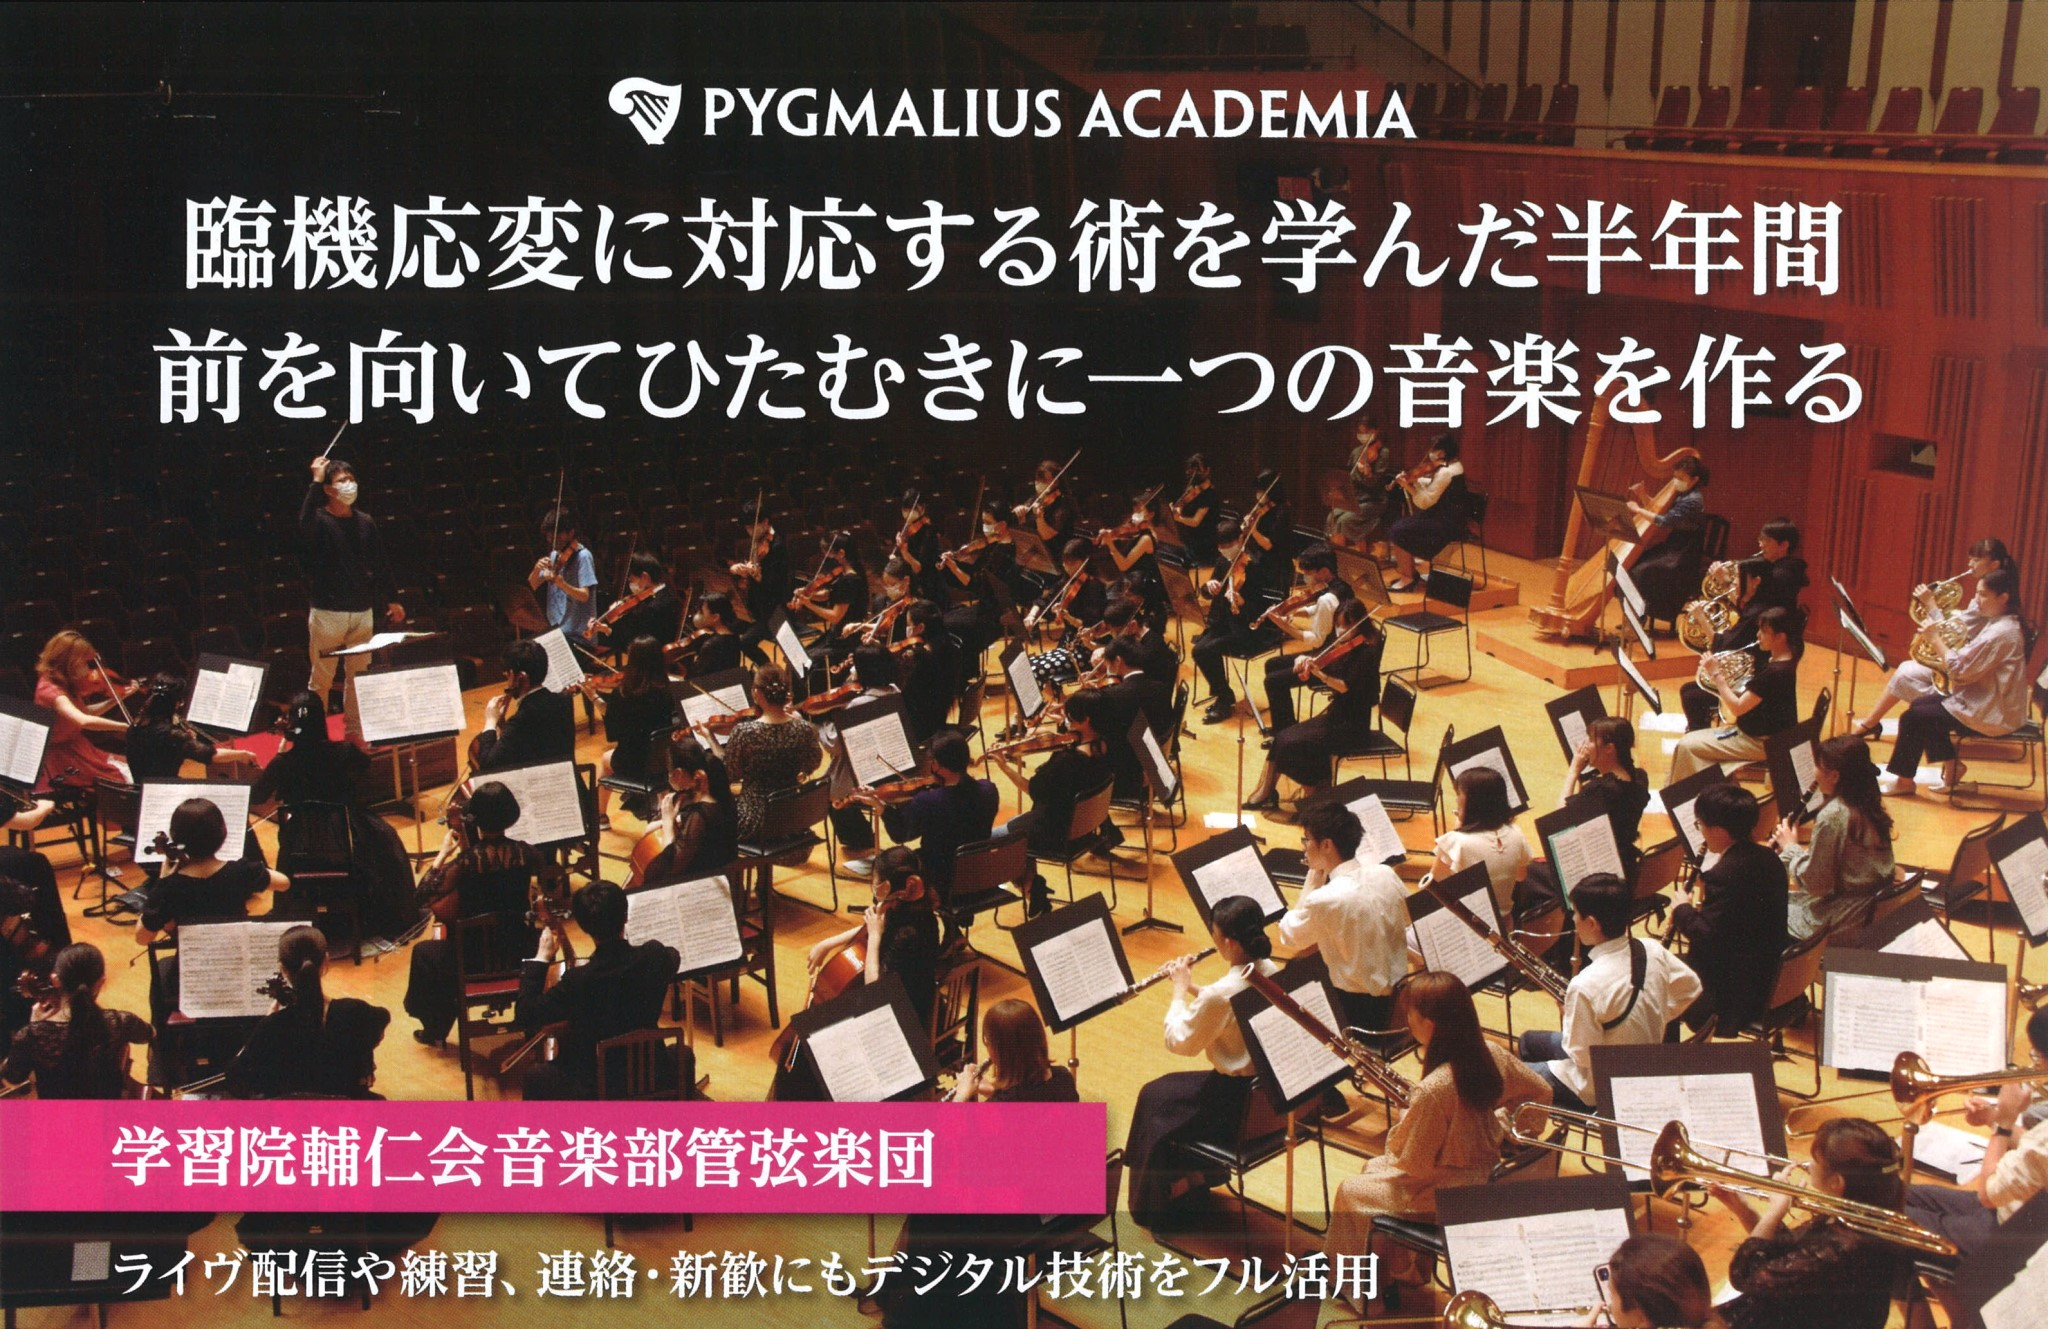 【NEWS:2021/9/1】『サラサーテ』21年10月号 学習院輔仁会音楽部管弦楽団との対談掲載